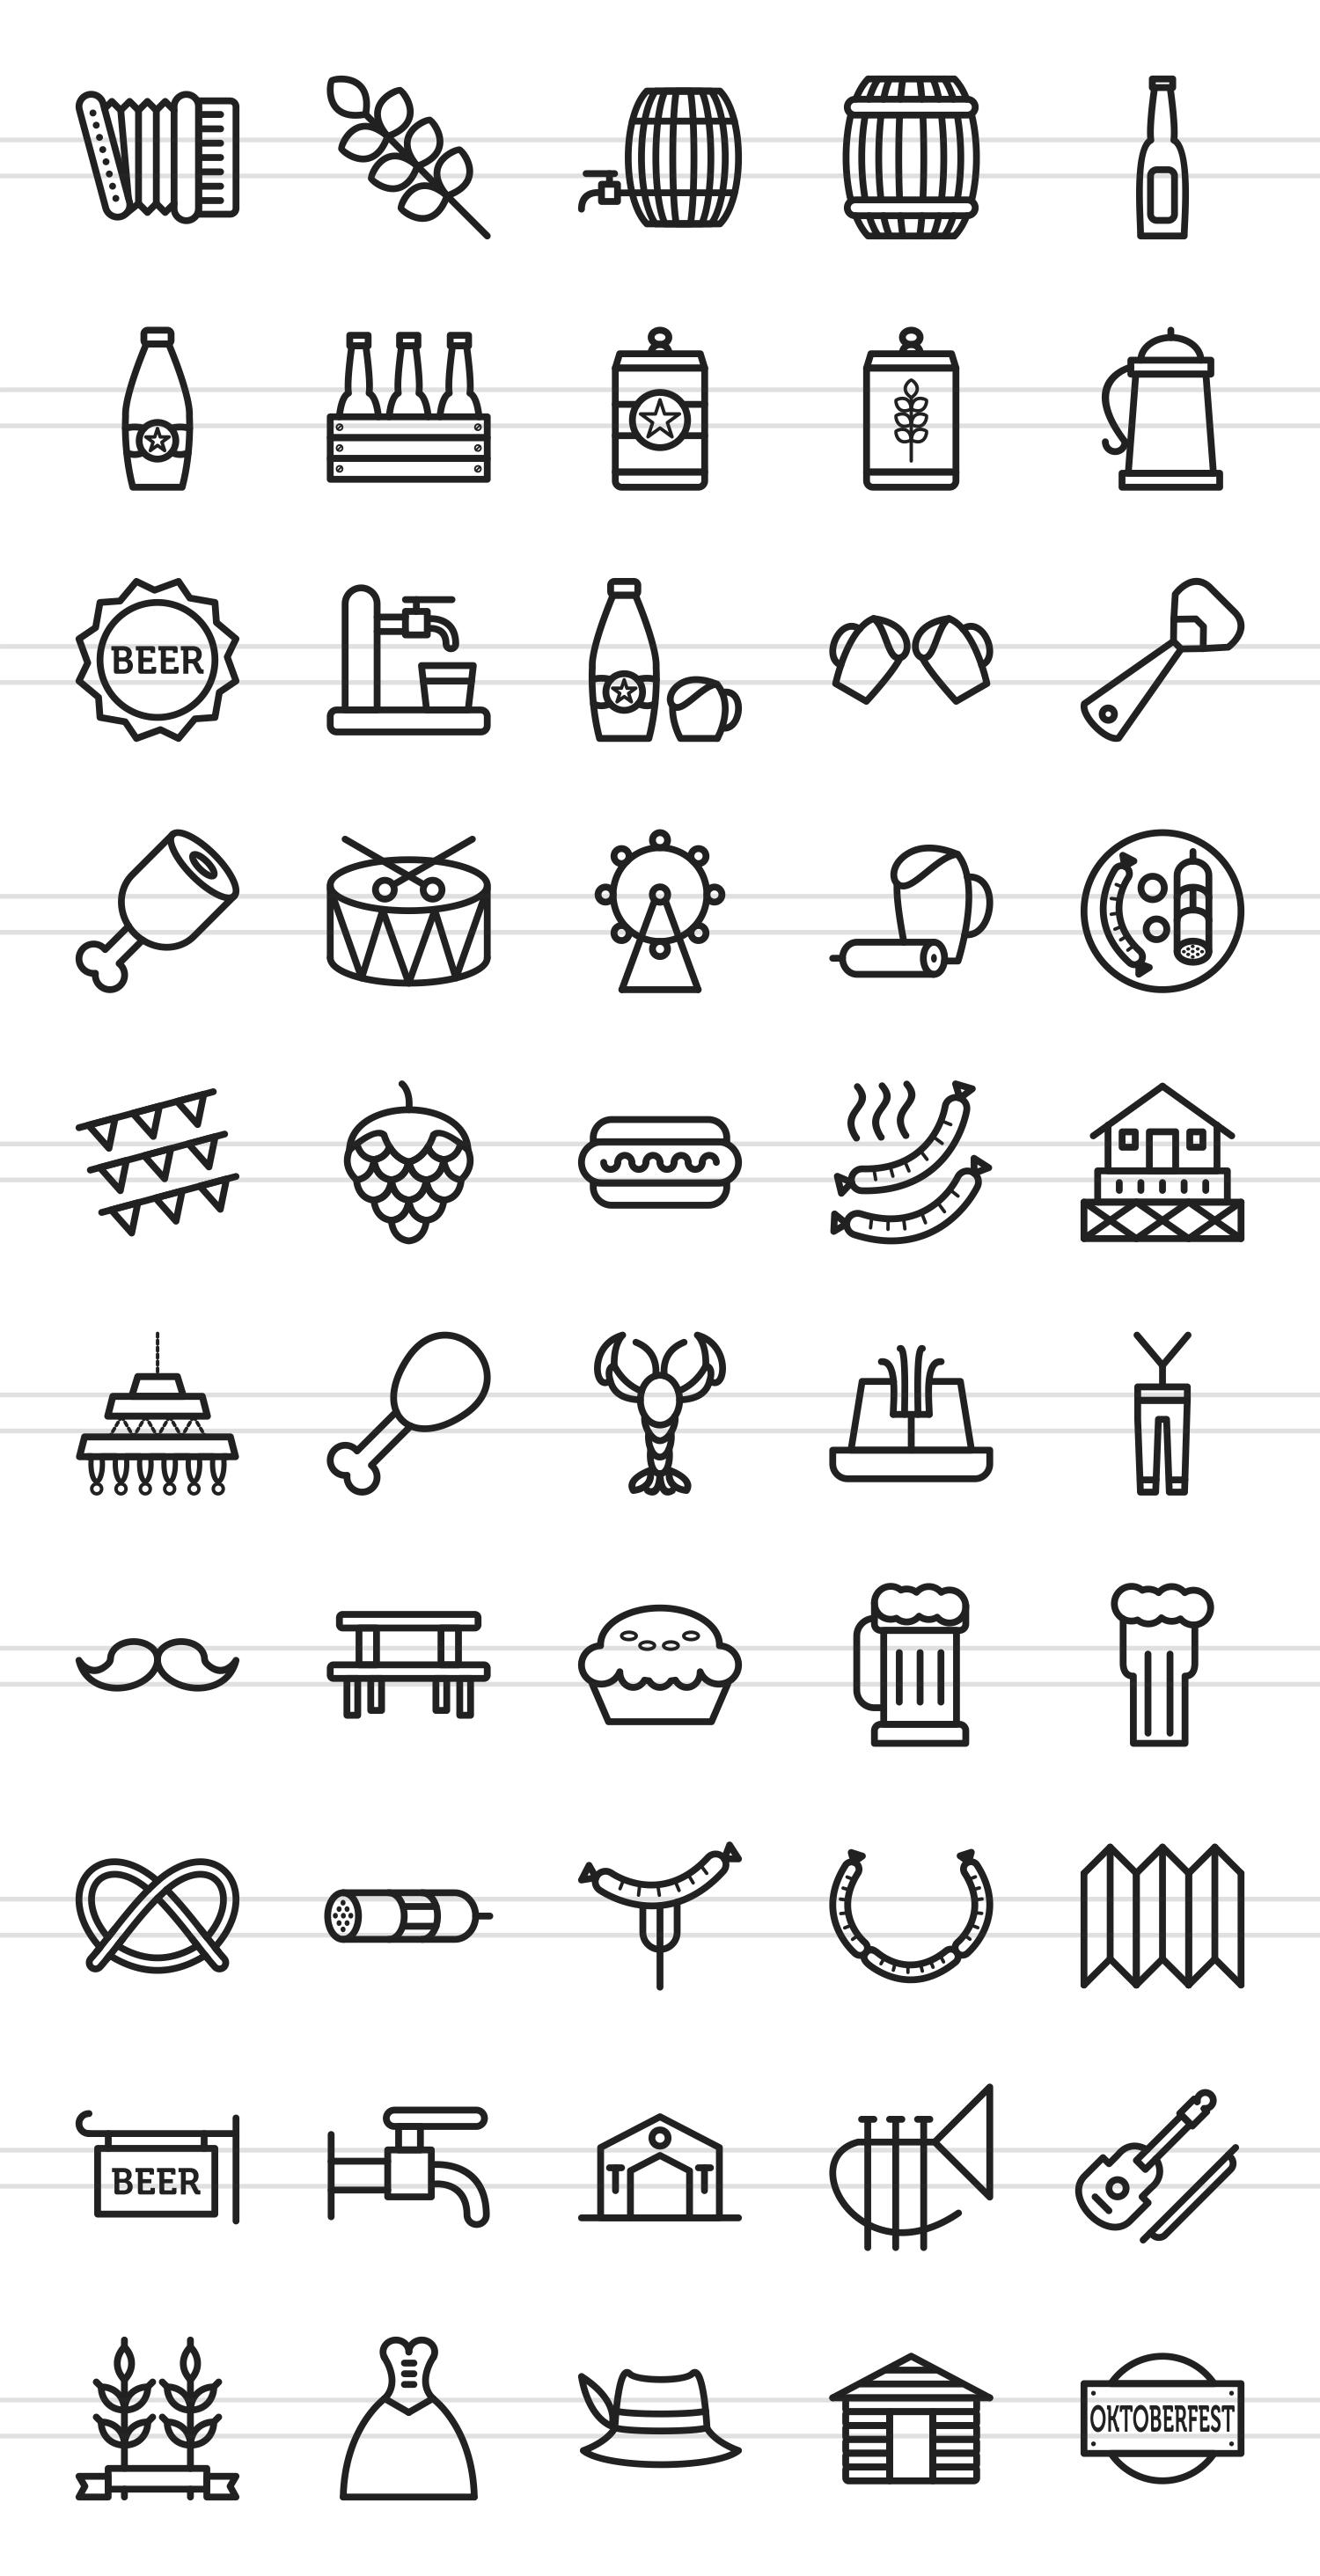 50 Oktoberfest Line Icons example image 2